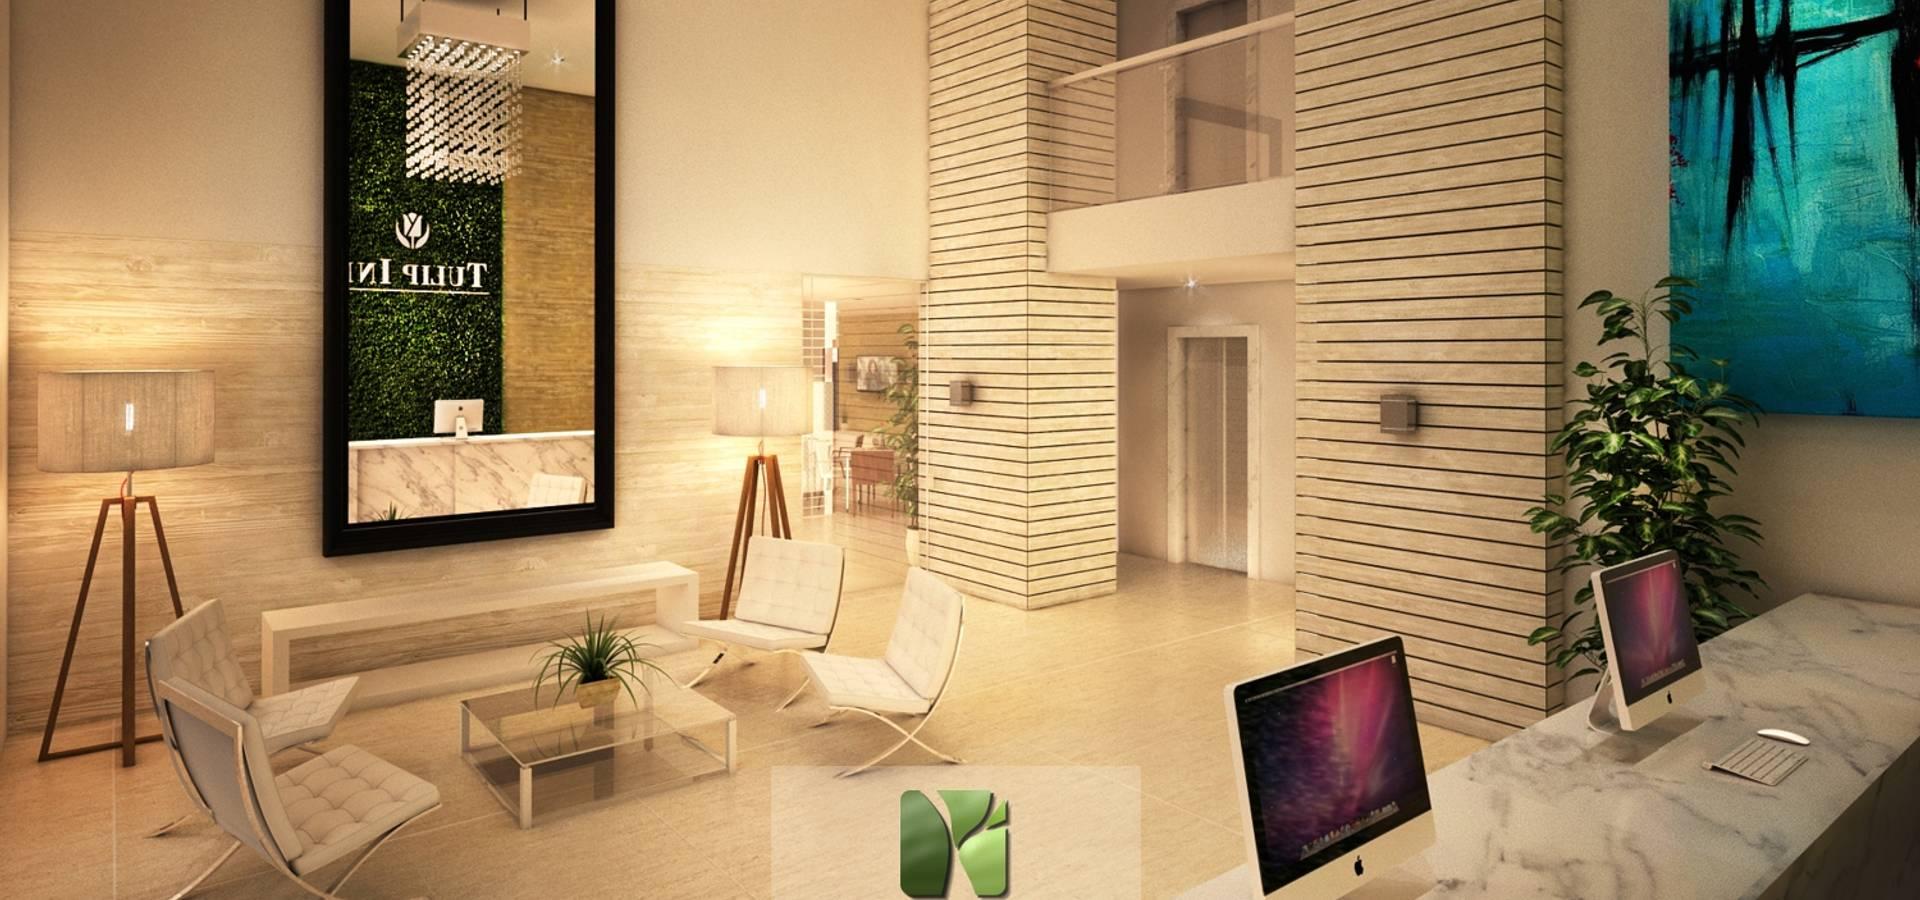 Moradaverde Arquitetura Ltda.